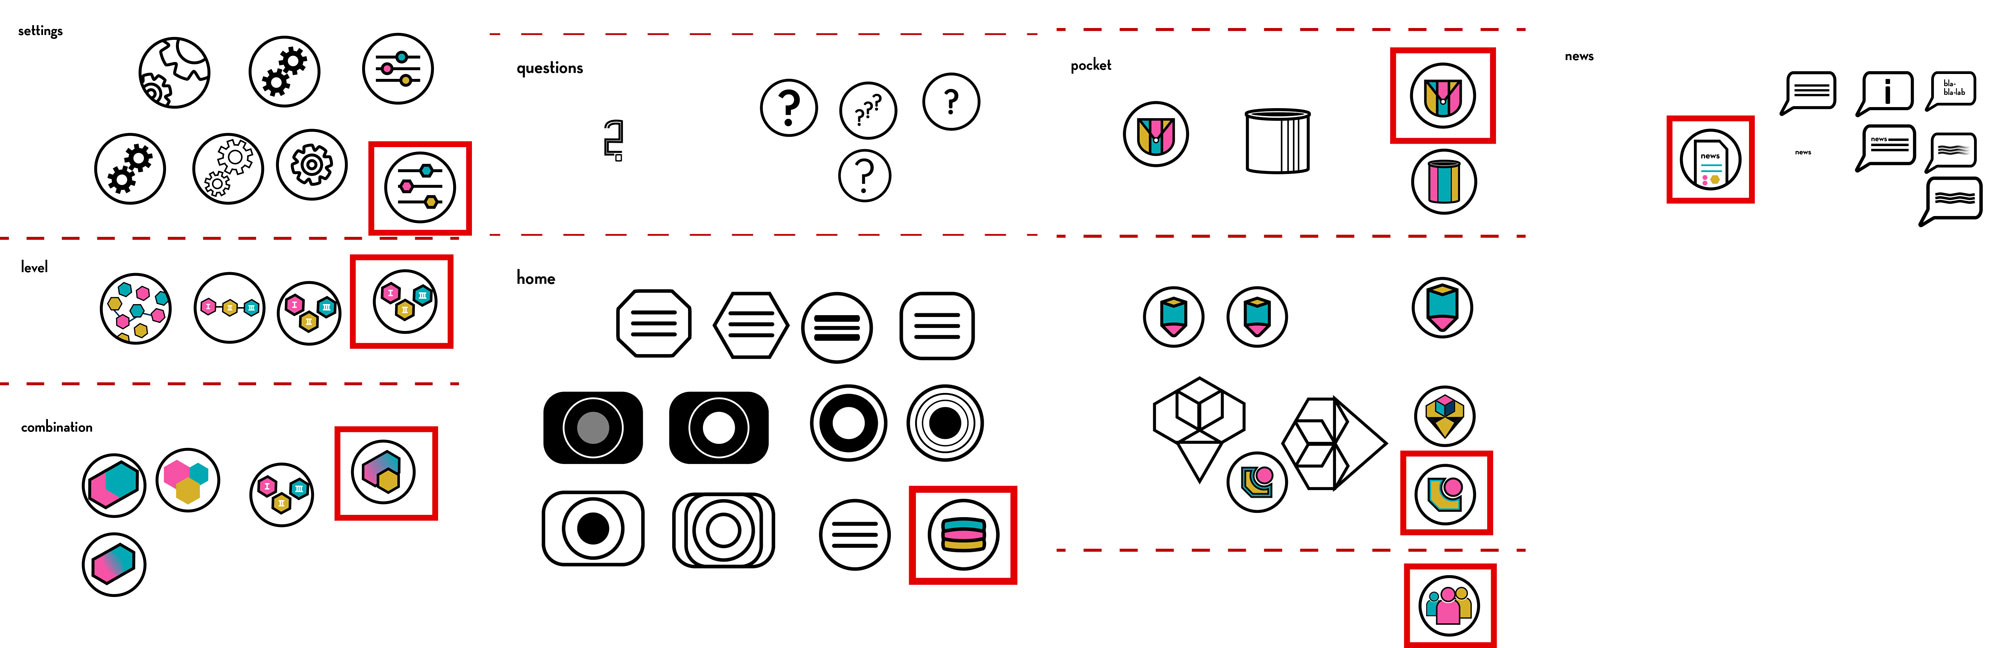 buttons-prepare.jpg